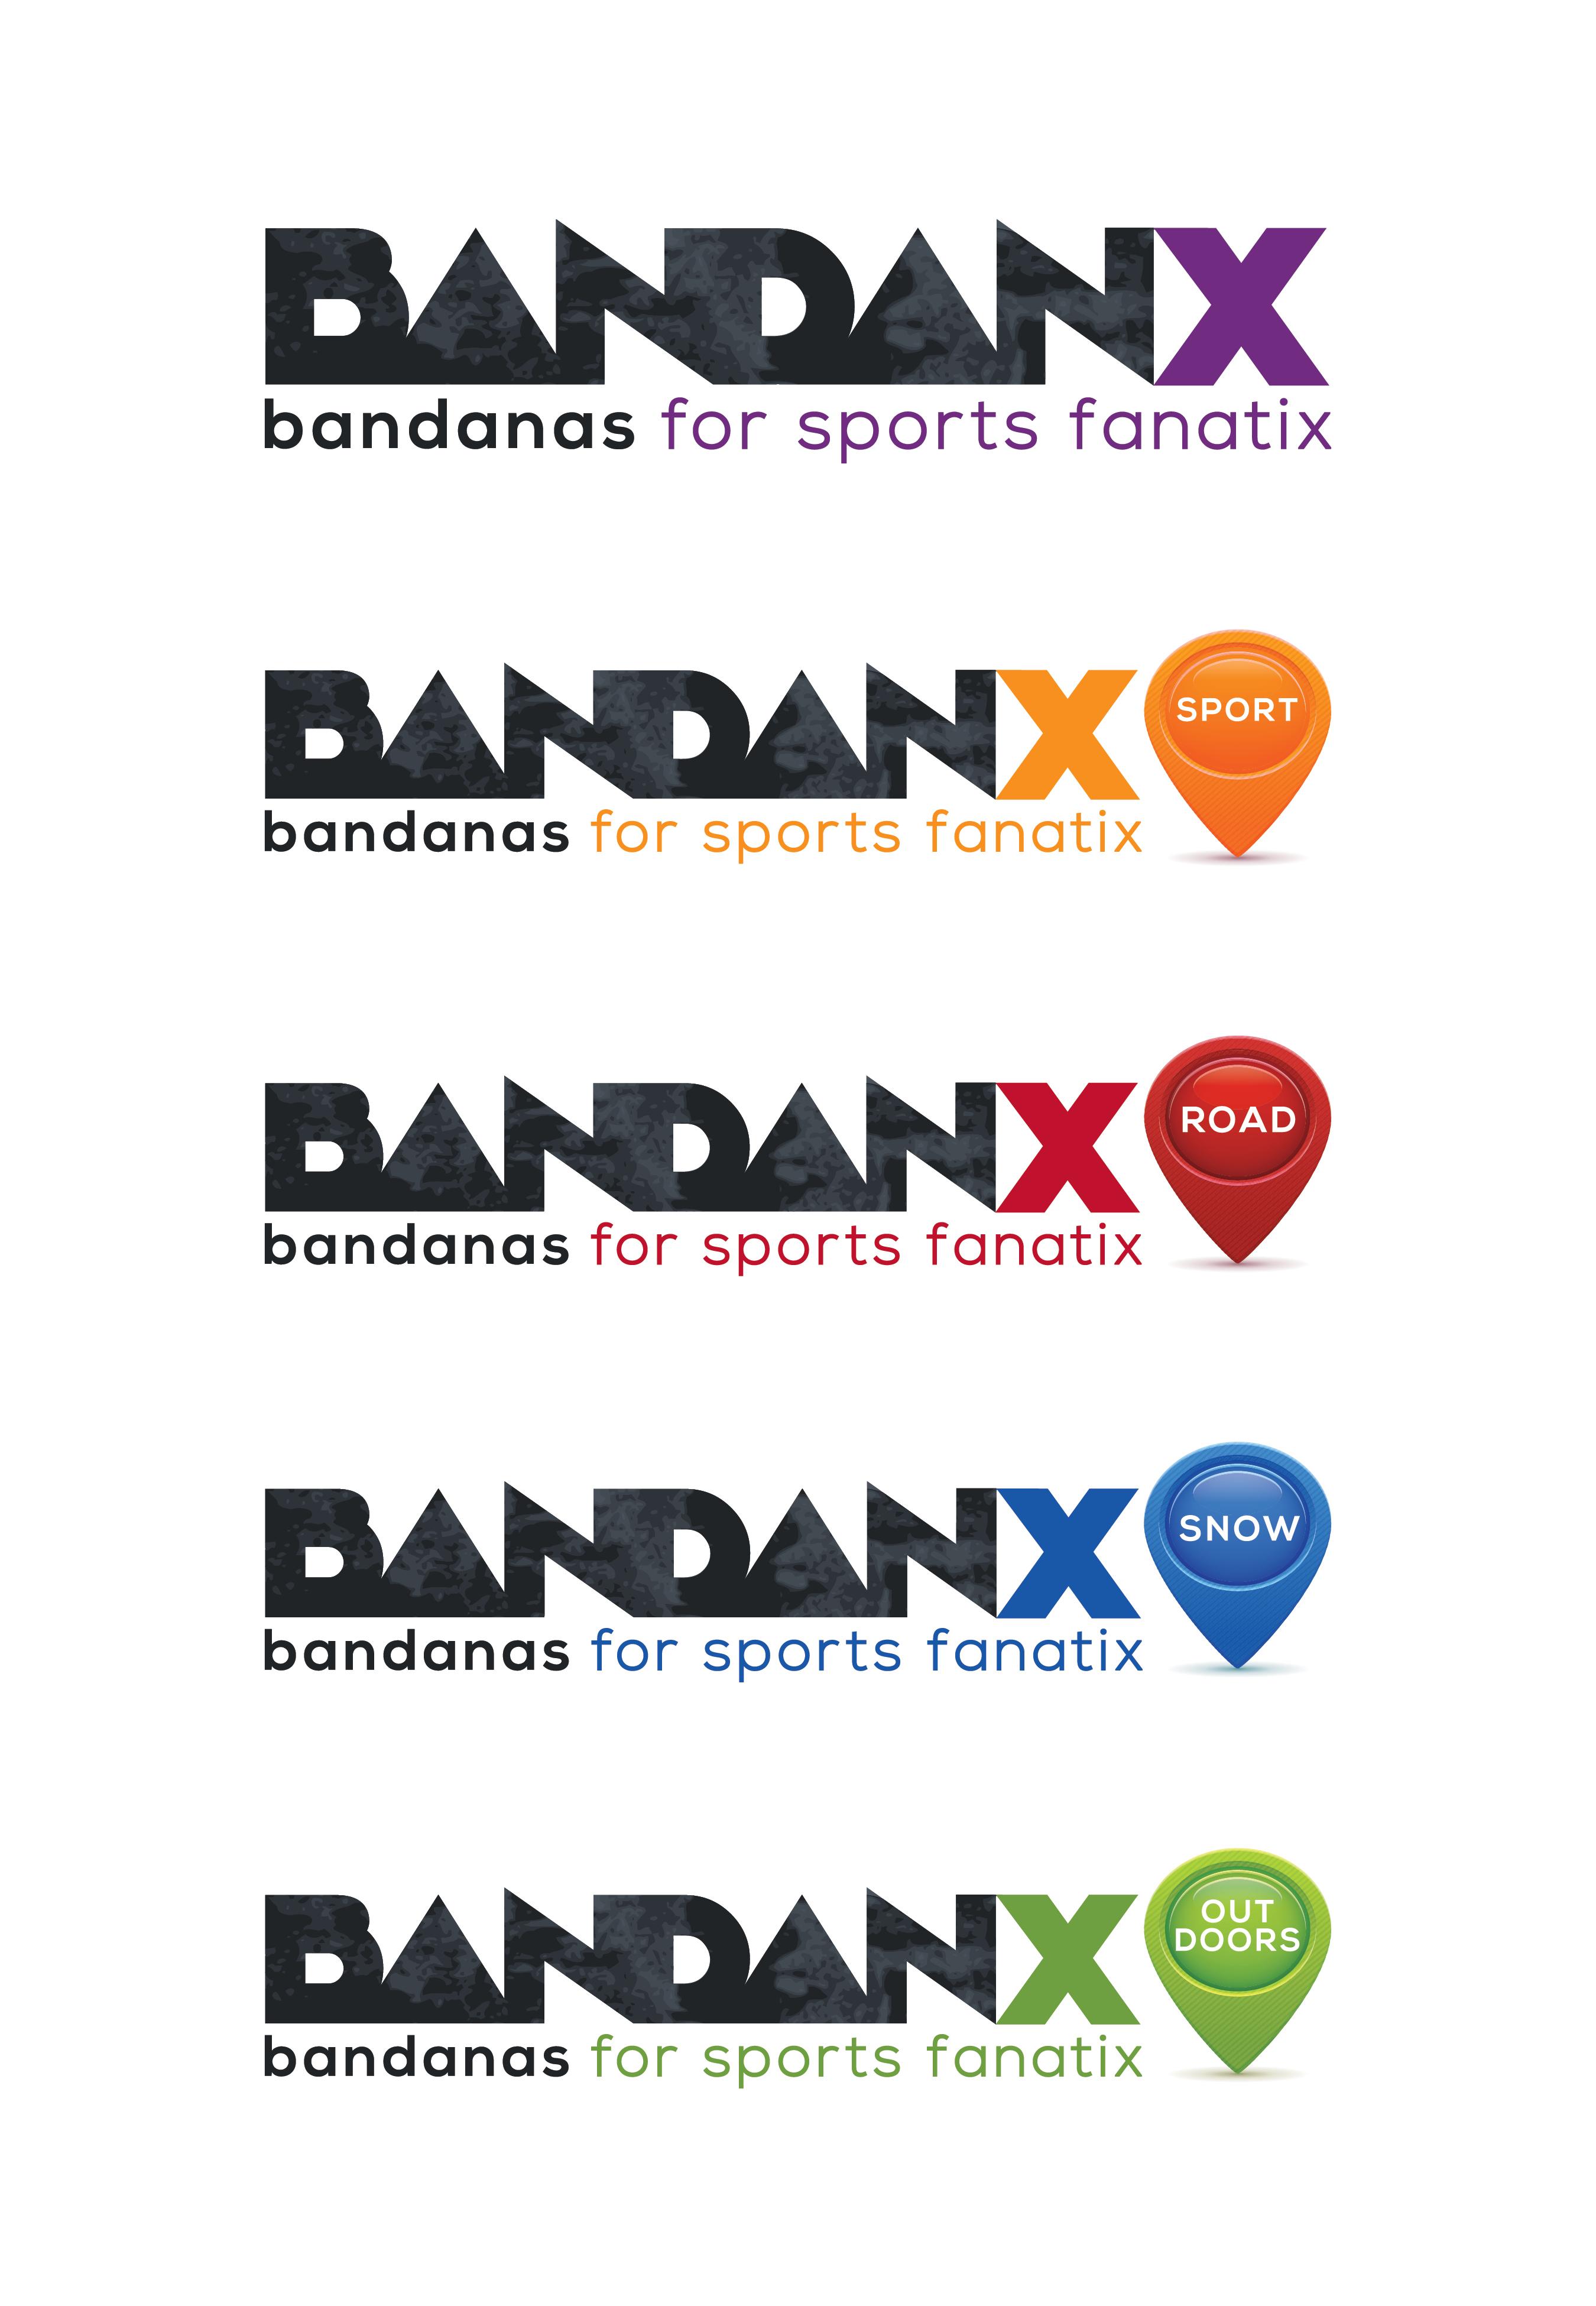 BandanX branding